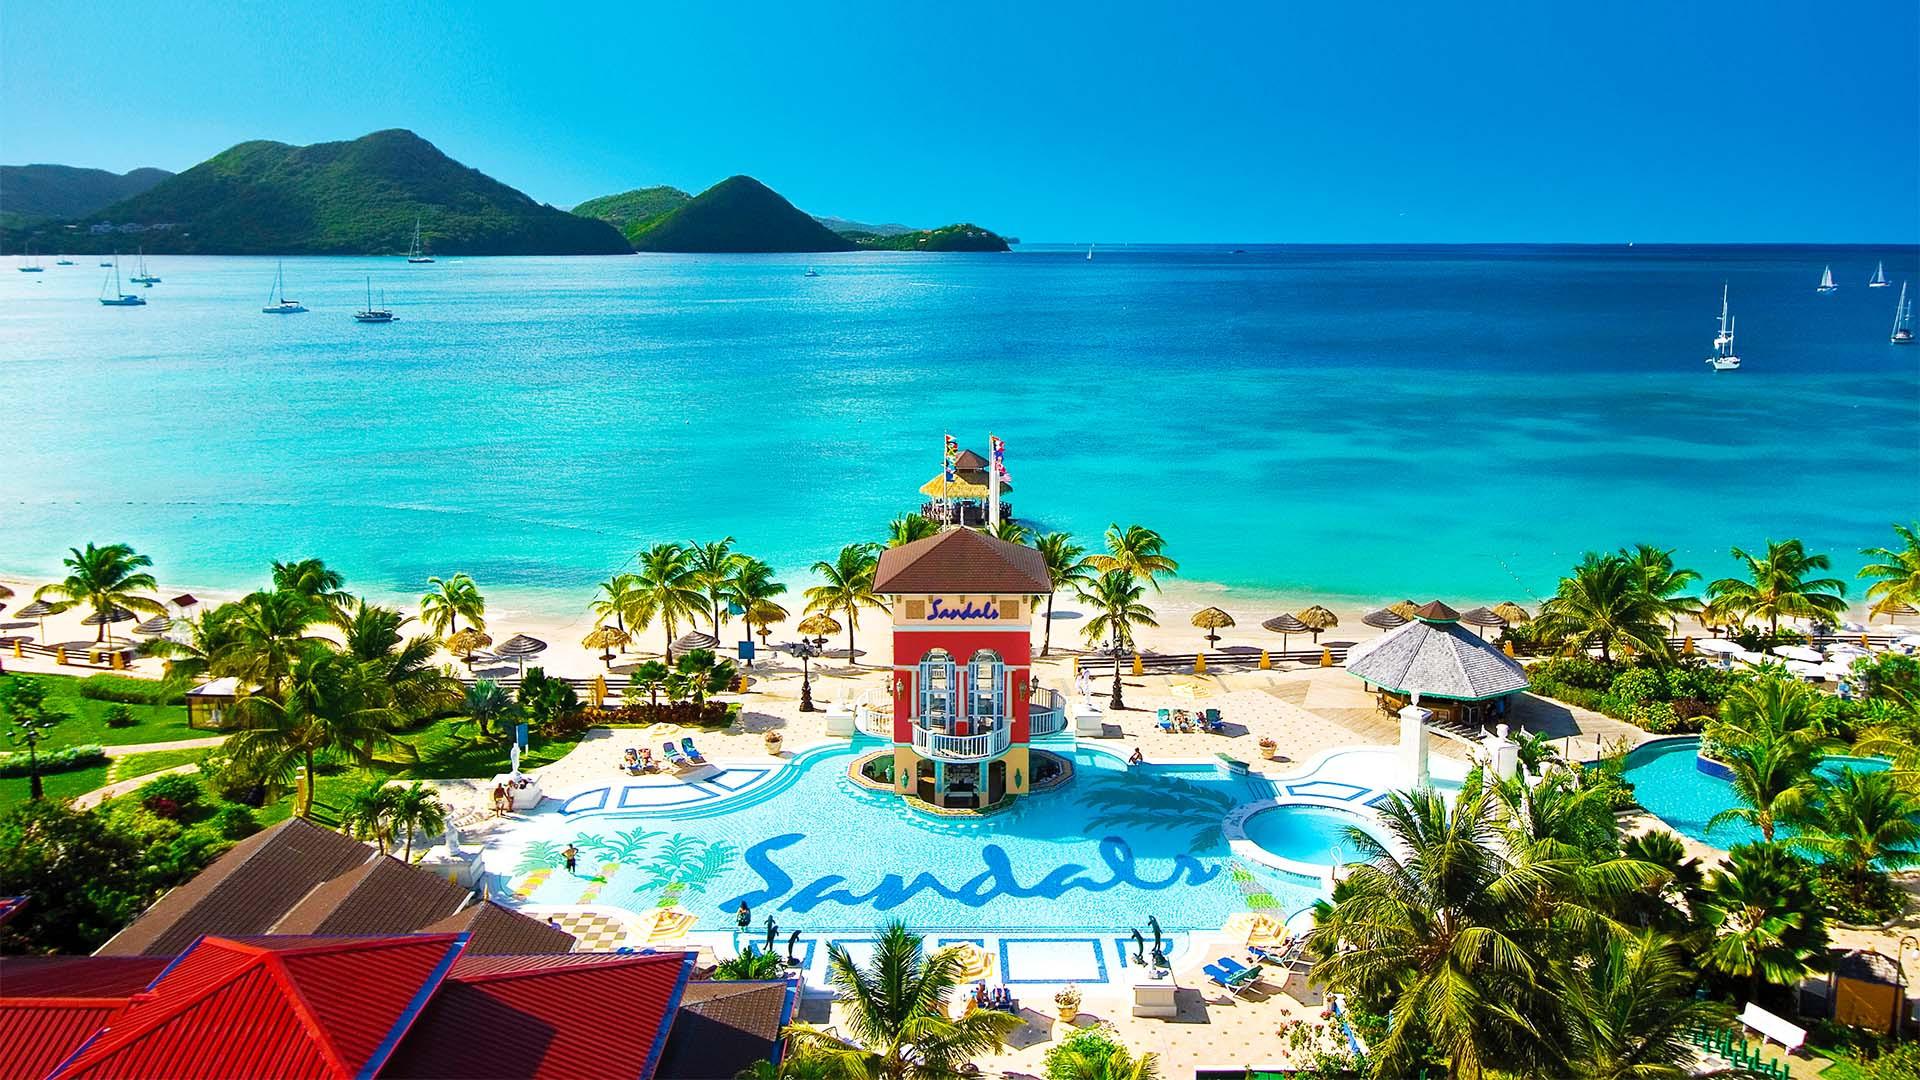 Sandals Grande Saint Lucian